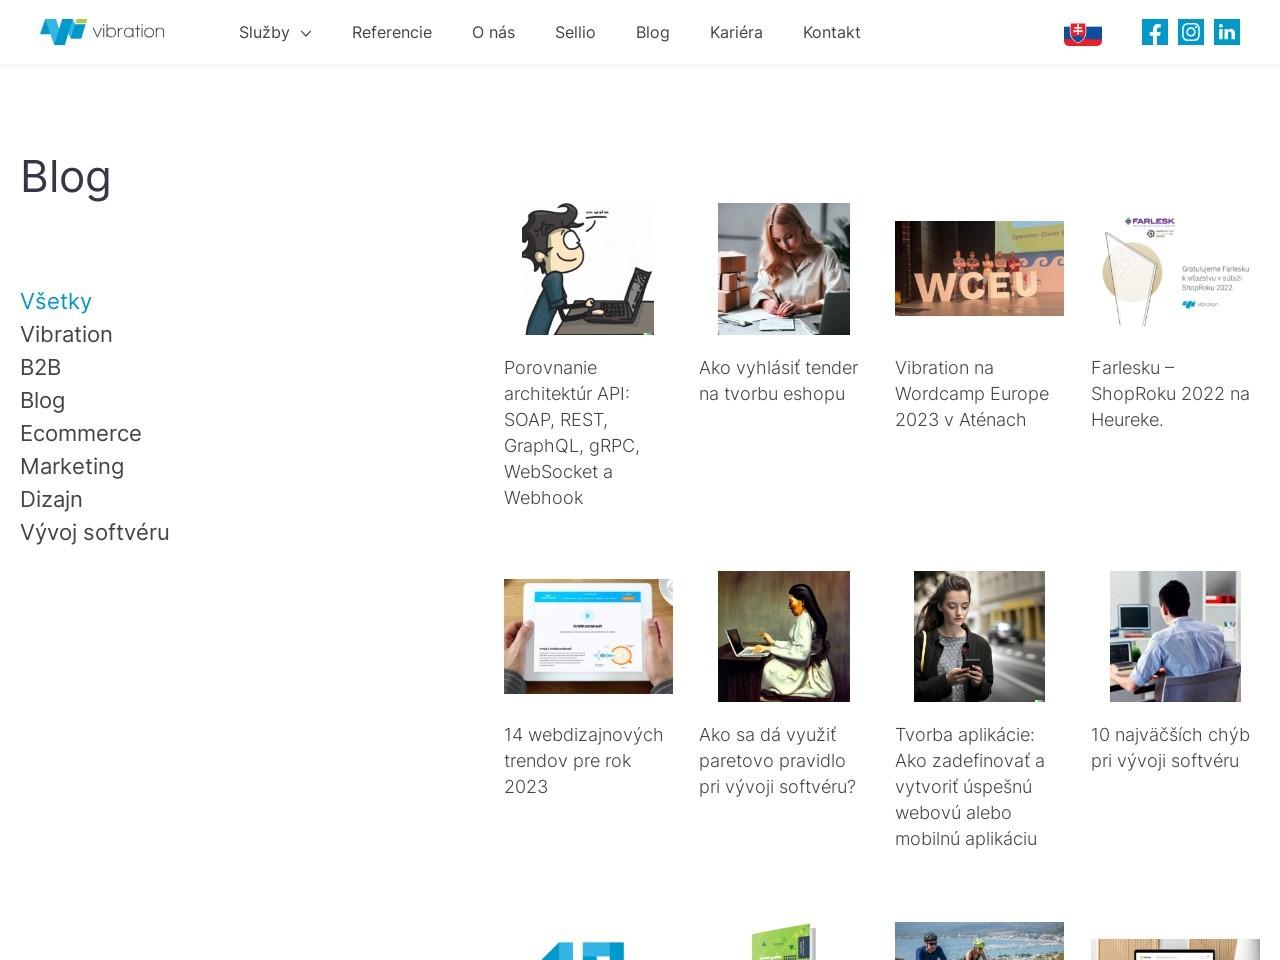 vibration.sk blog